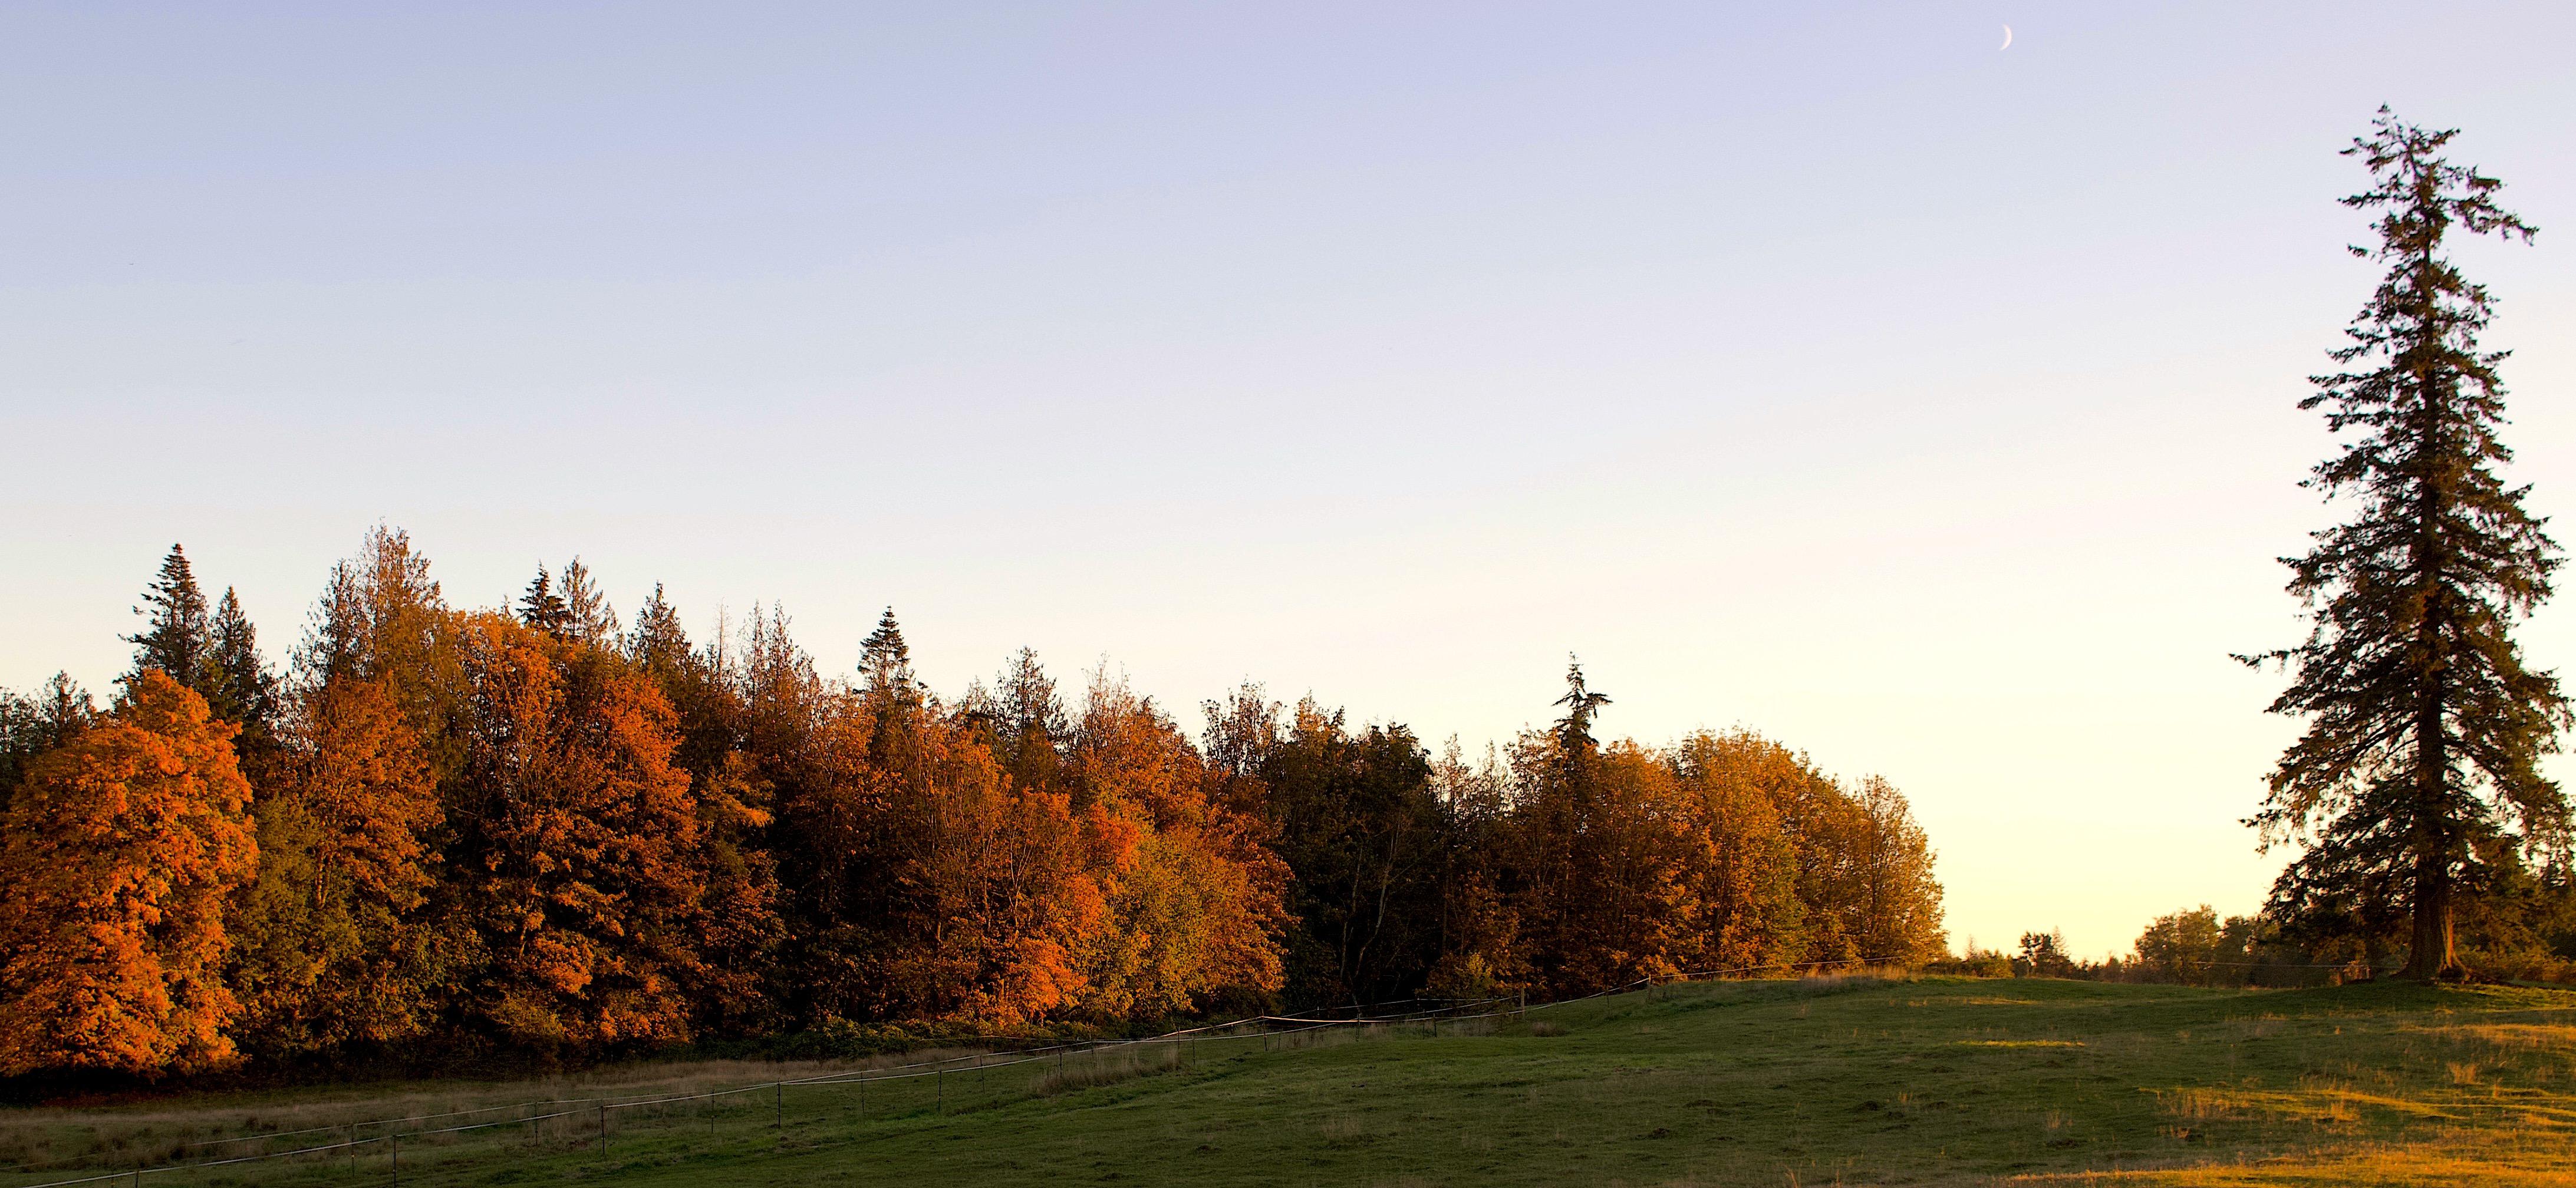 eveningoctfield2